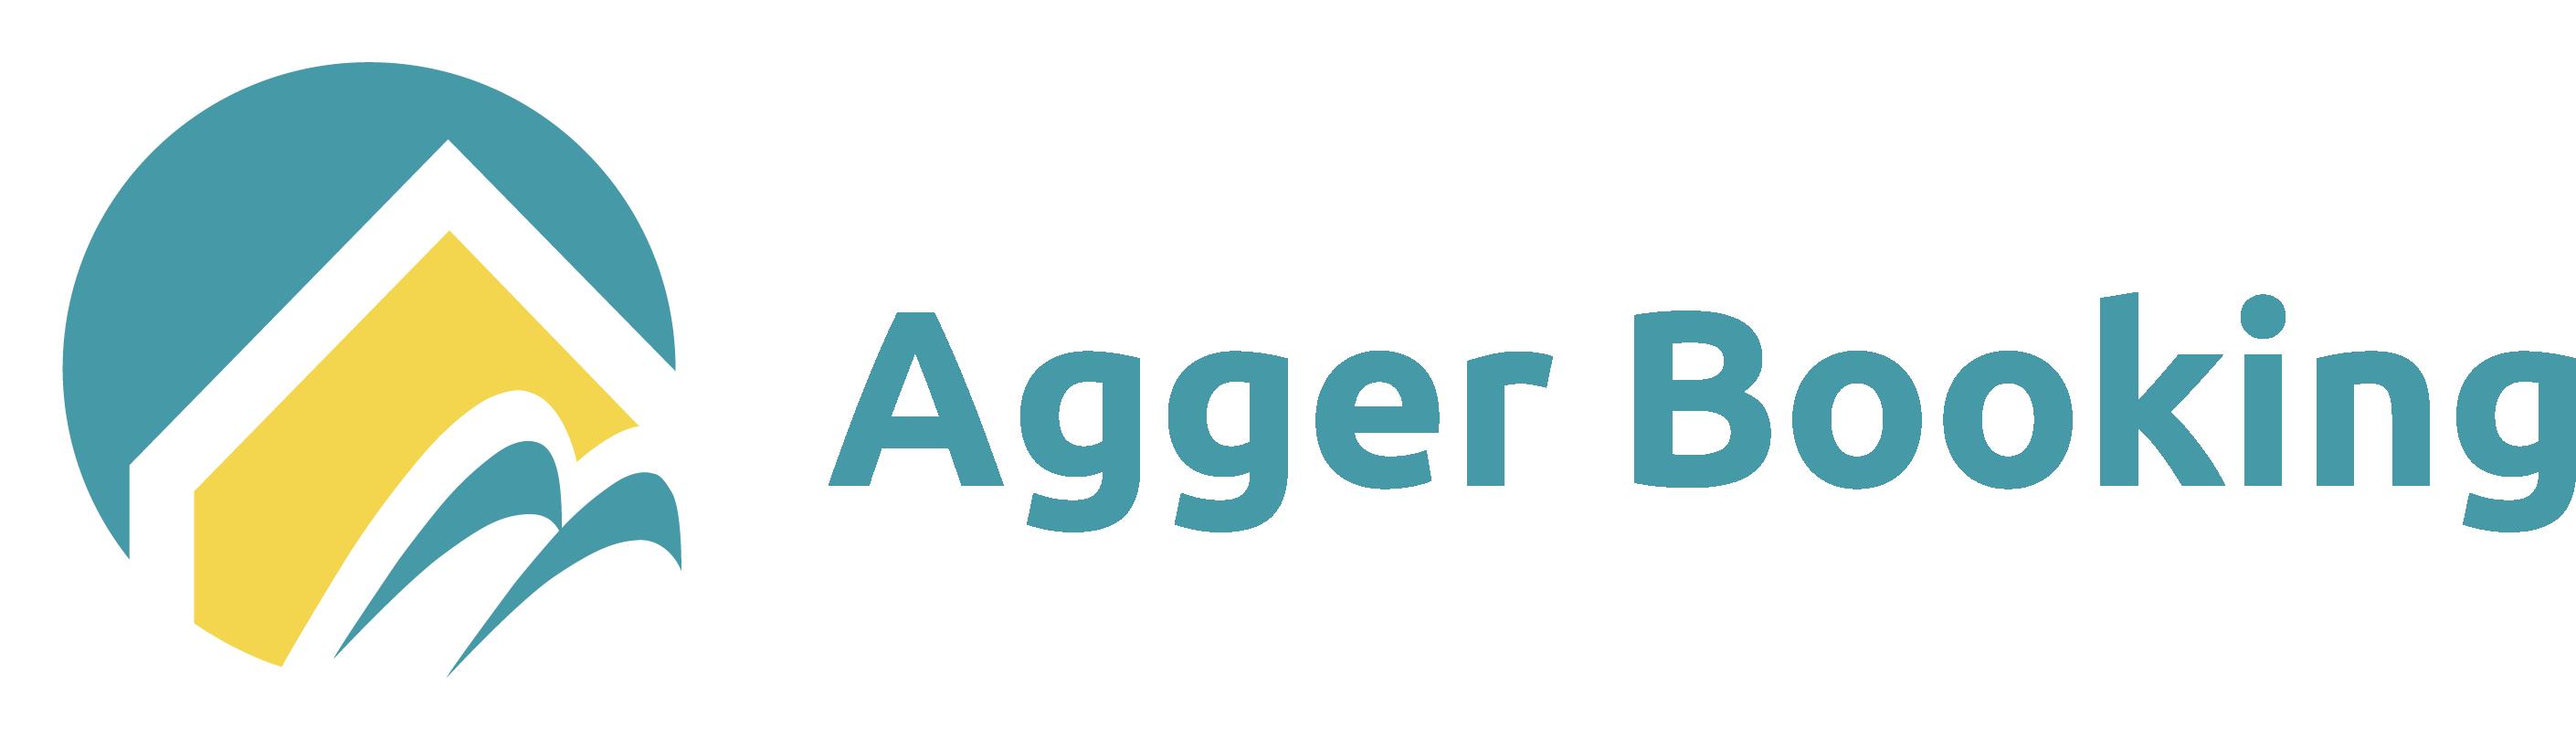 Aktiviteter – Aggerbooking